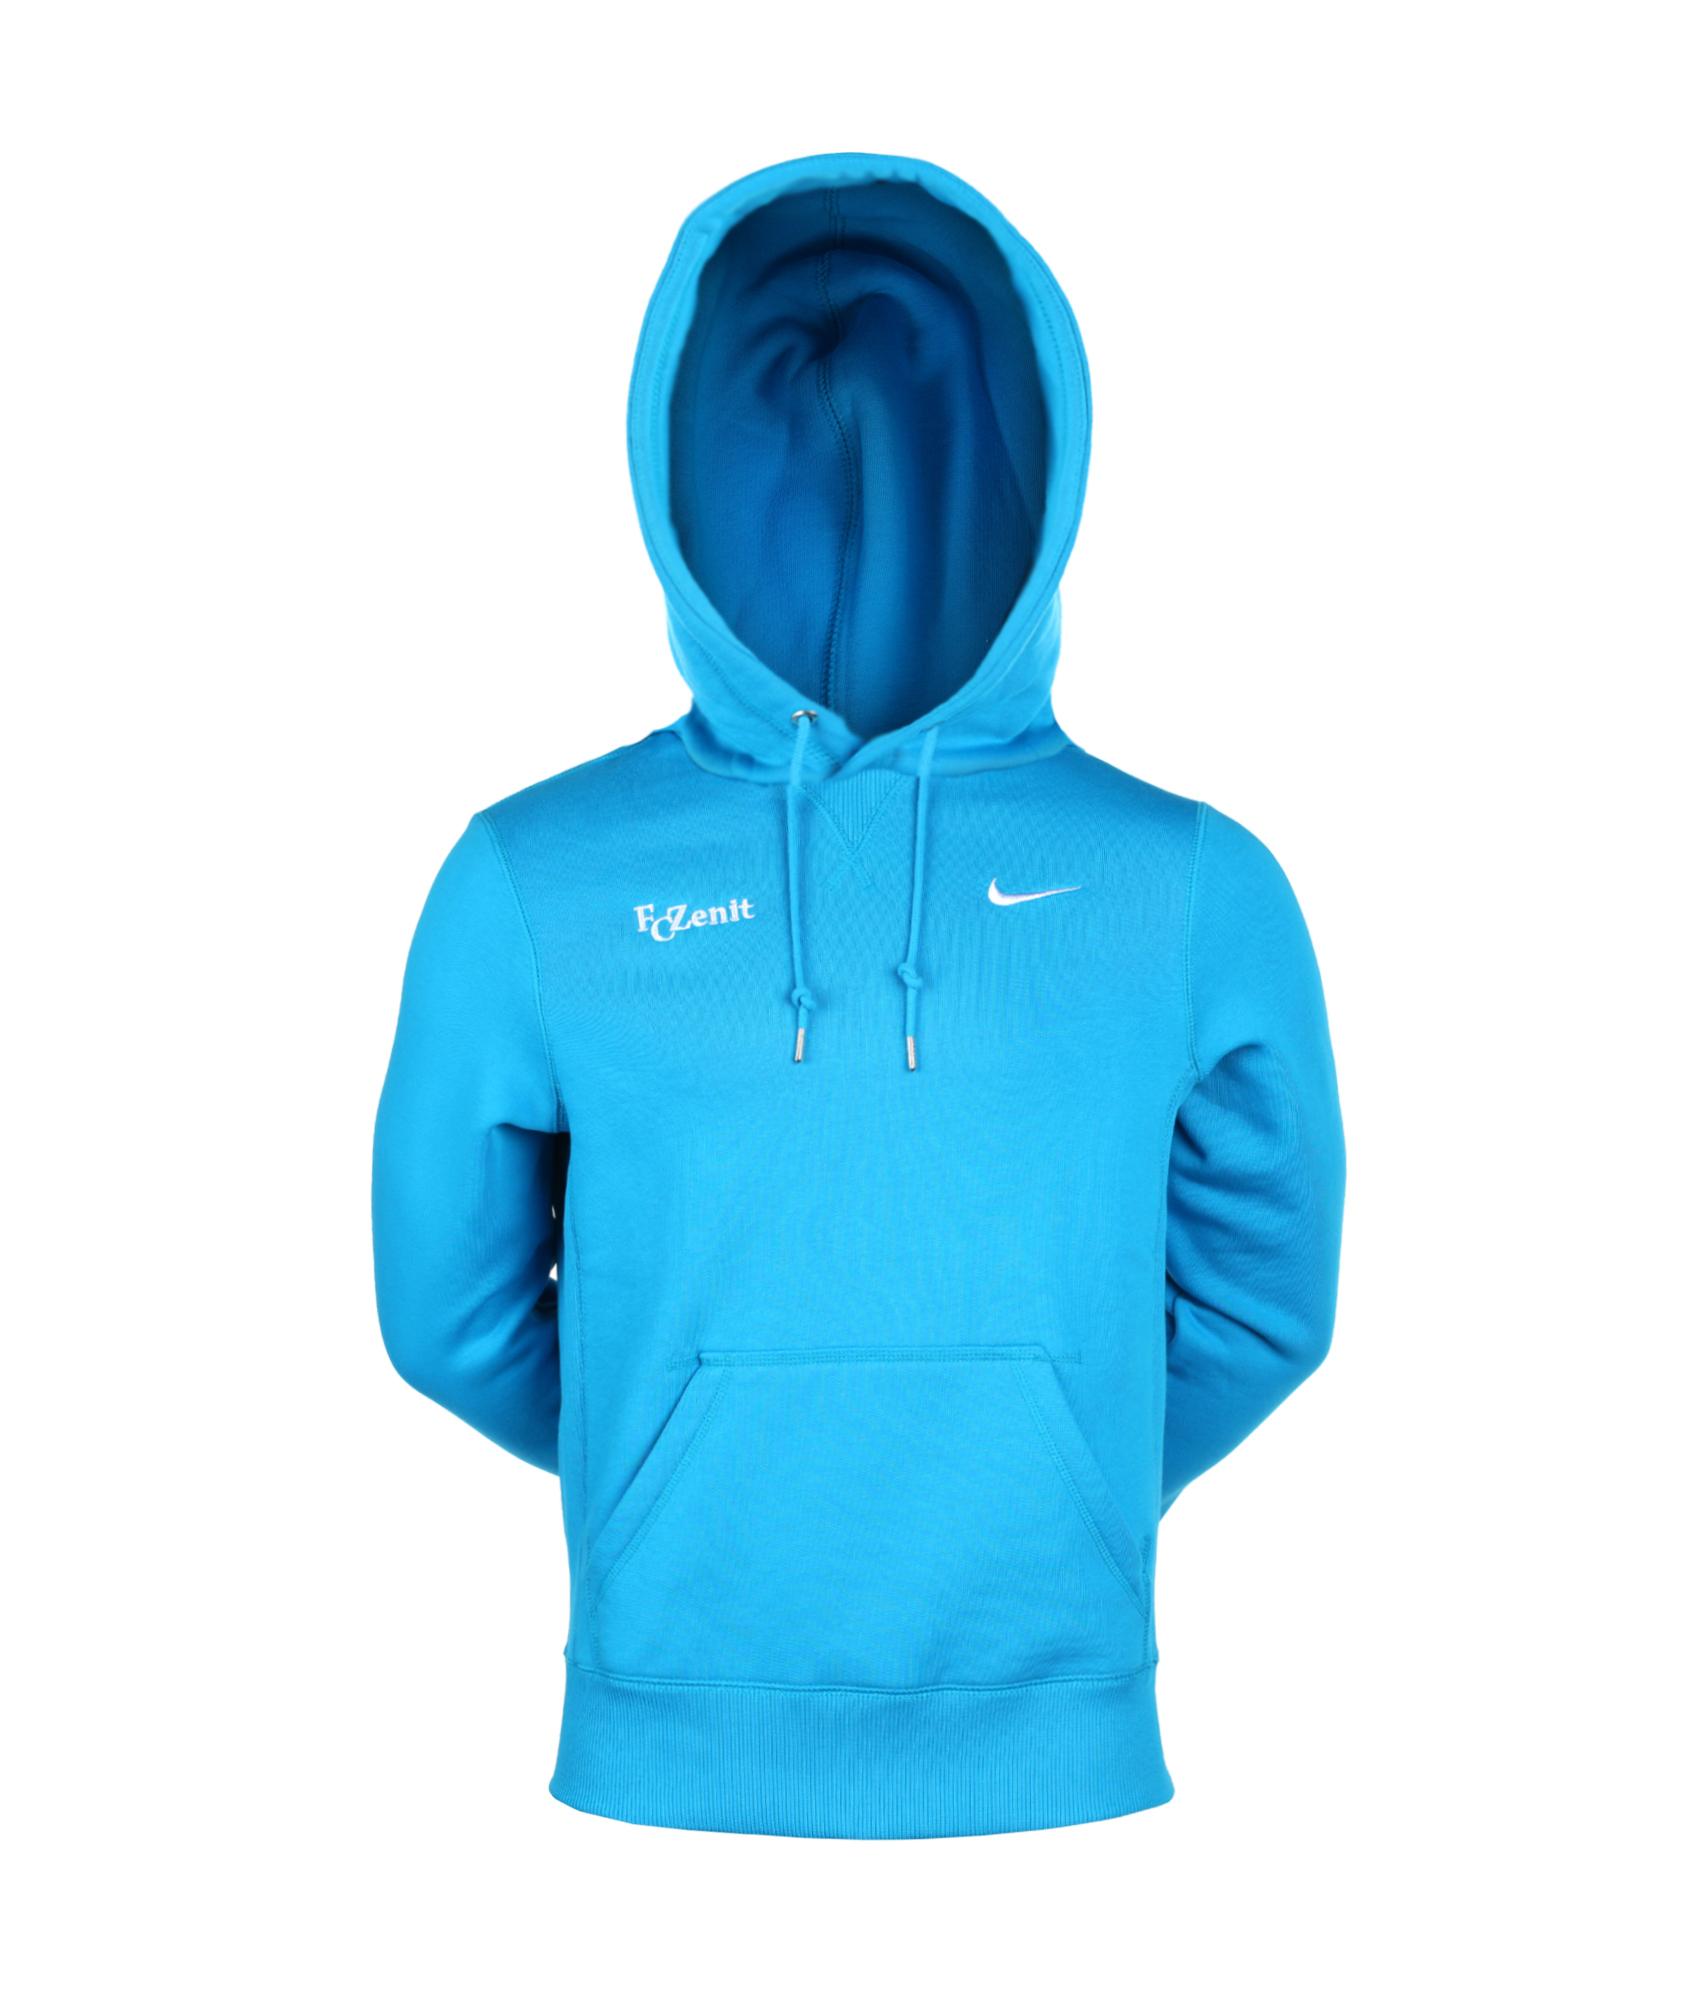 Толстовка Nike Squad Fleece PO Hoody , Цвет-Голубой, Размер-L